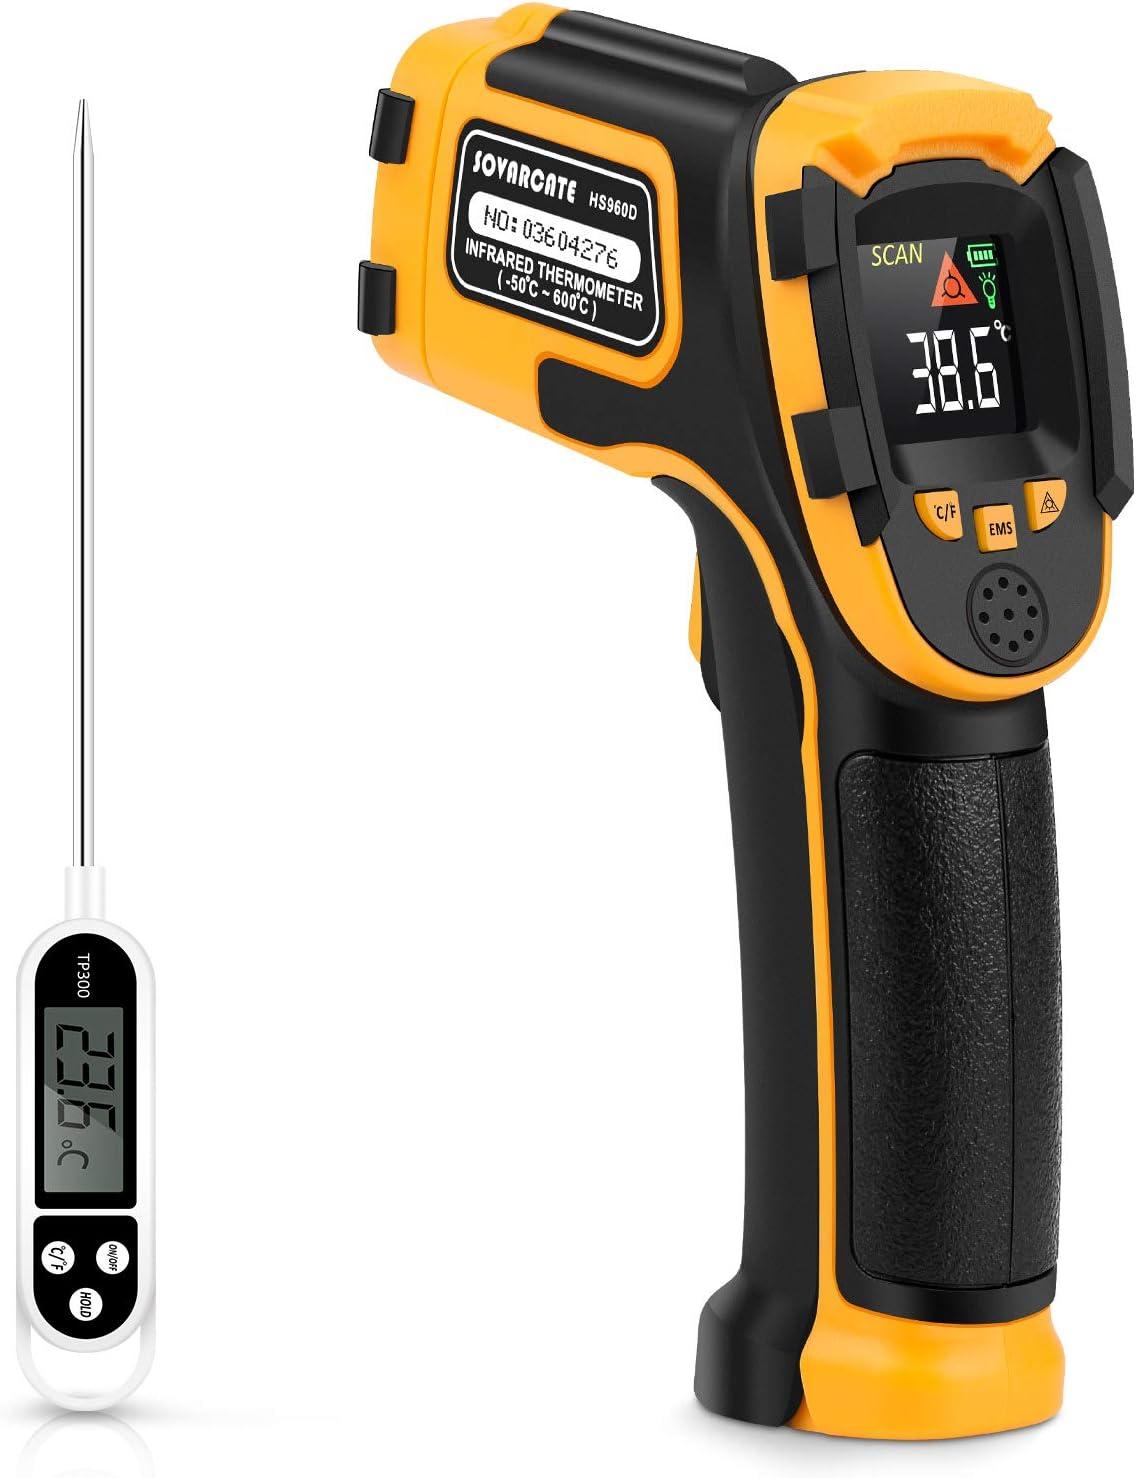 Akozon Thermometer Digital IR01 Series LCD Display No-contact Digital Infrared Thermometer IR01B